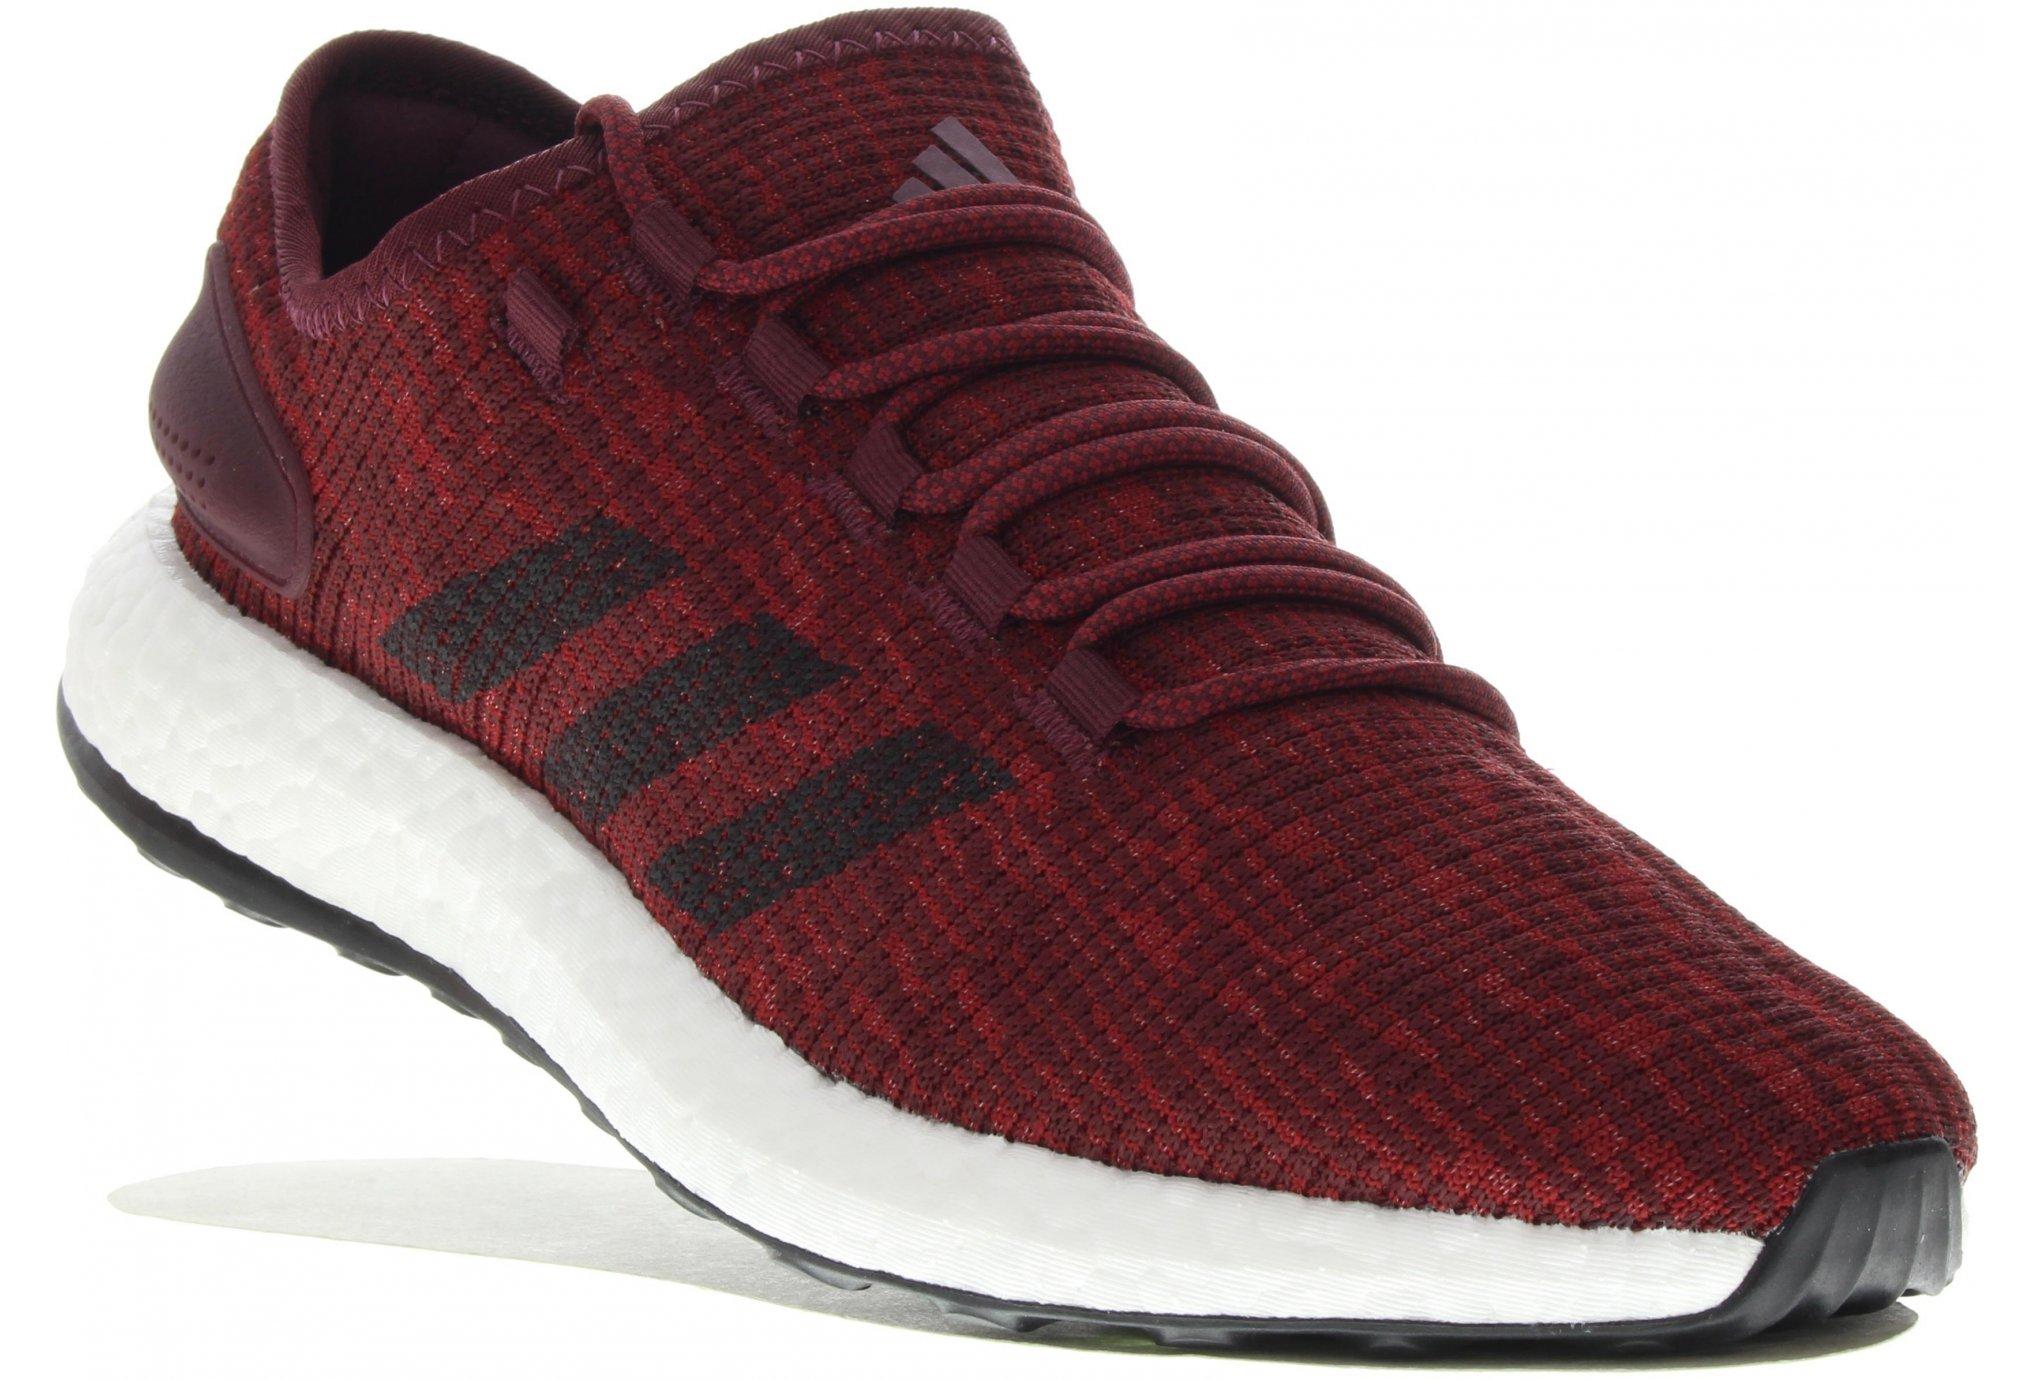 adidas PureBoost M Chaussures homme